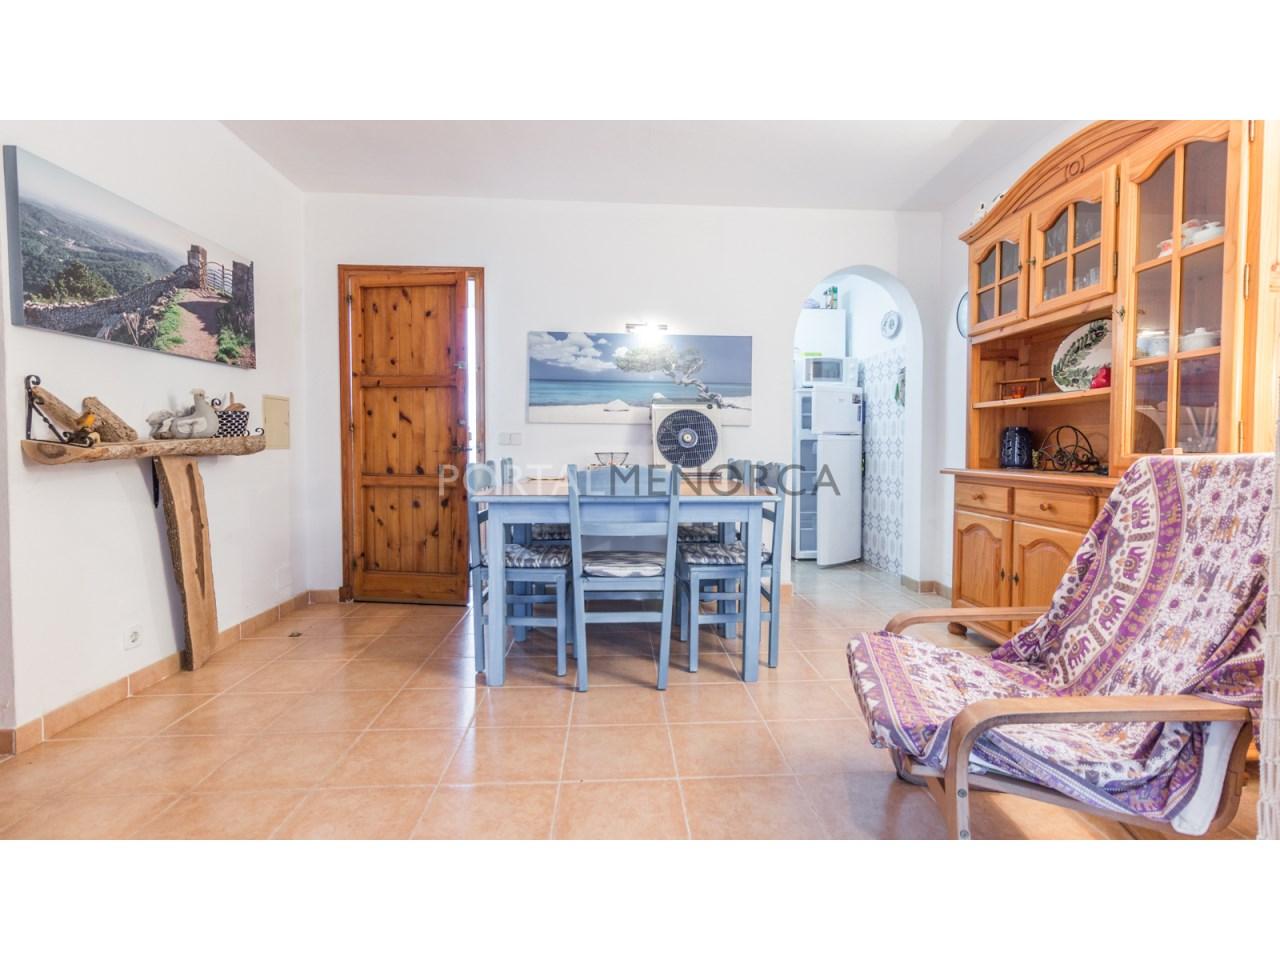 apartament for sale in calan porter menorca (1 de 7)